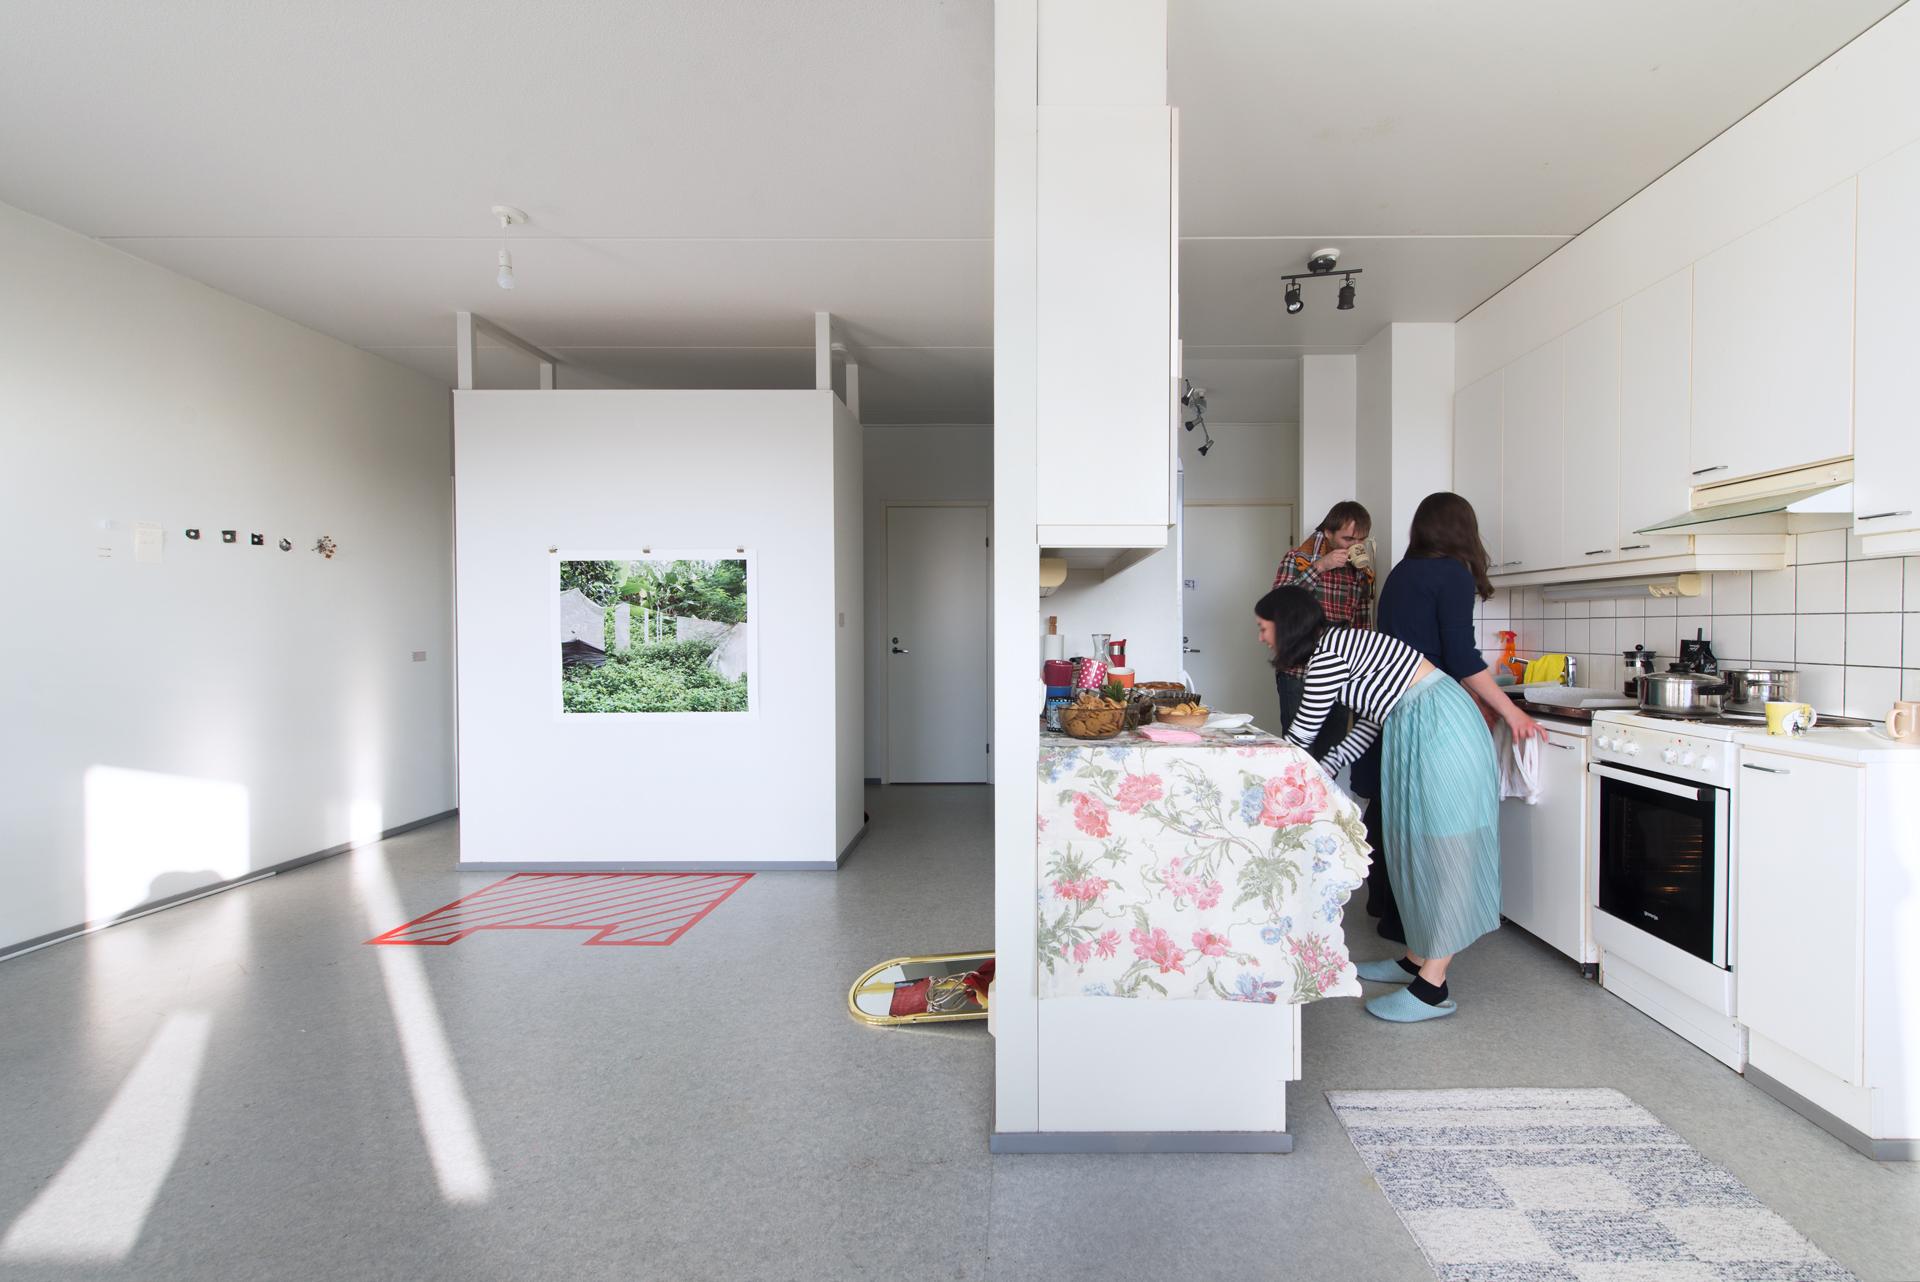 12_Unfurnished-Unfinished exhibition installation_0381.jpg